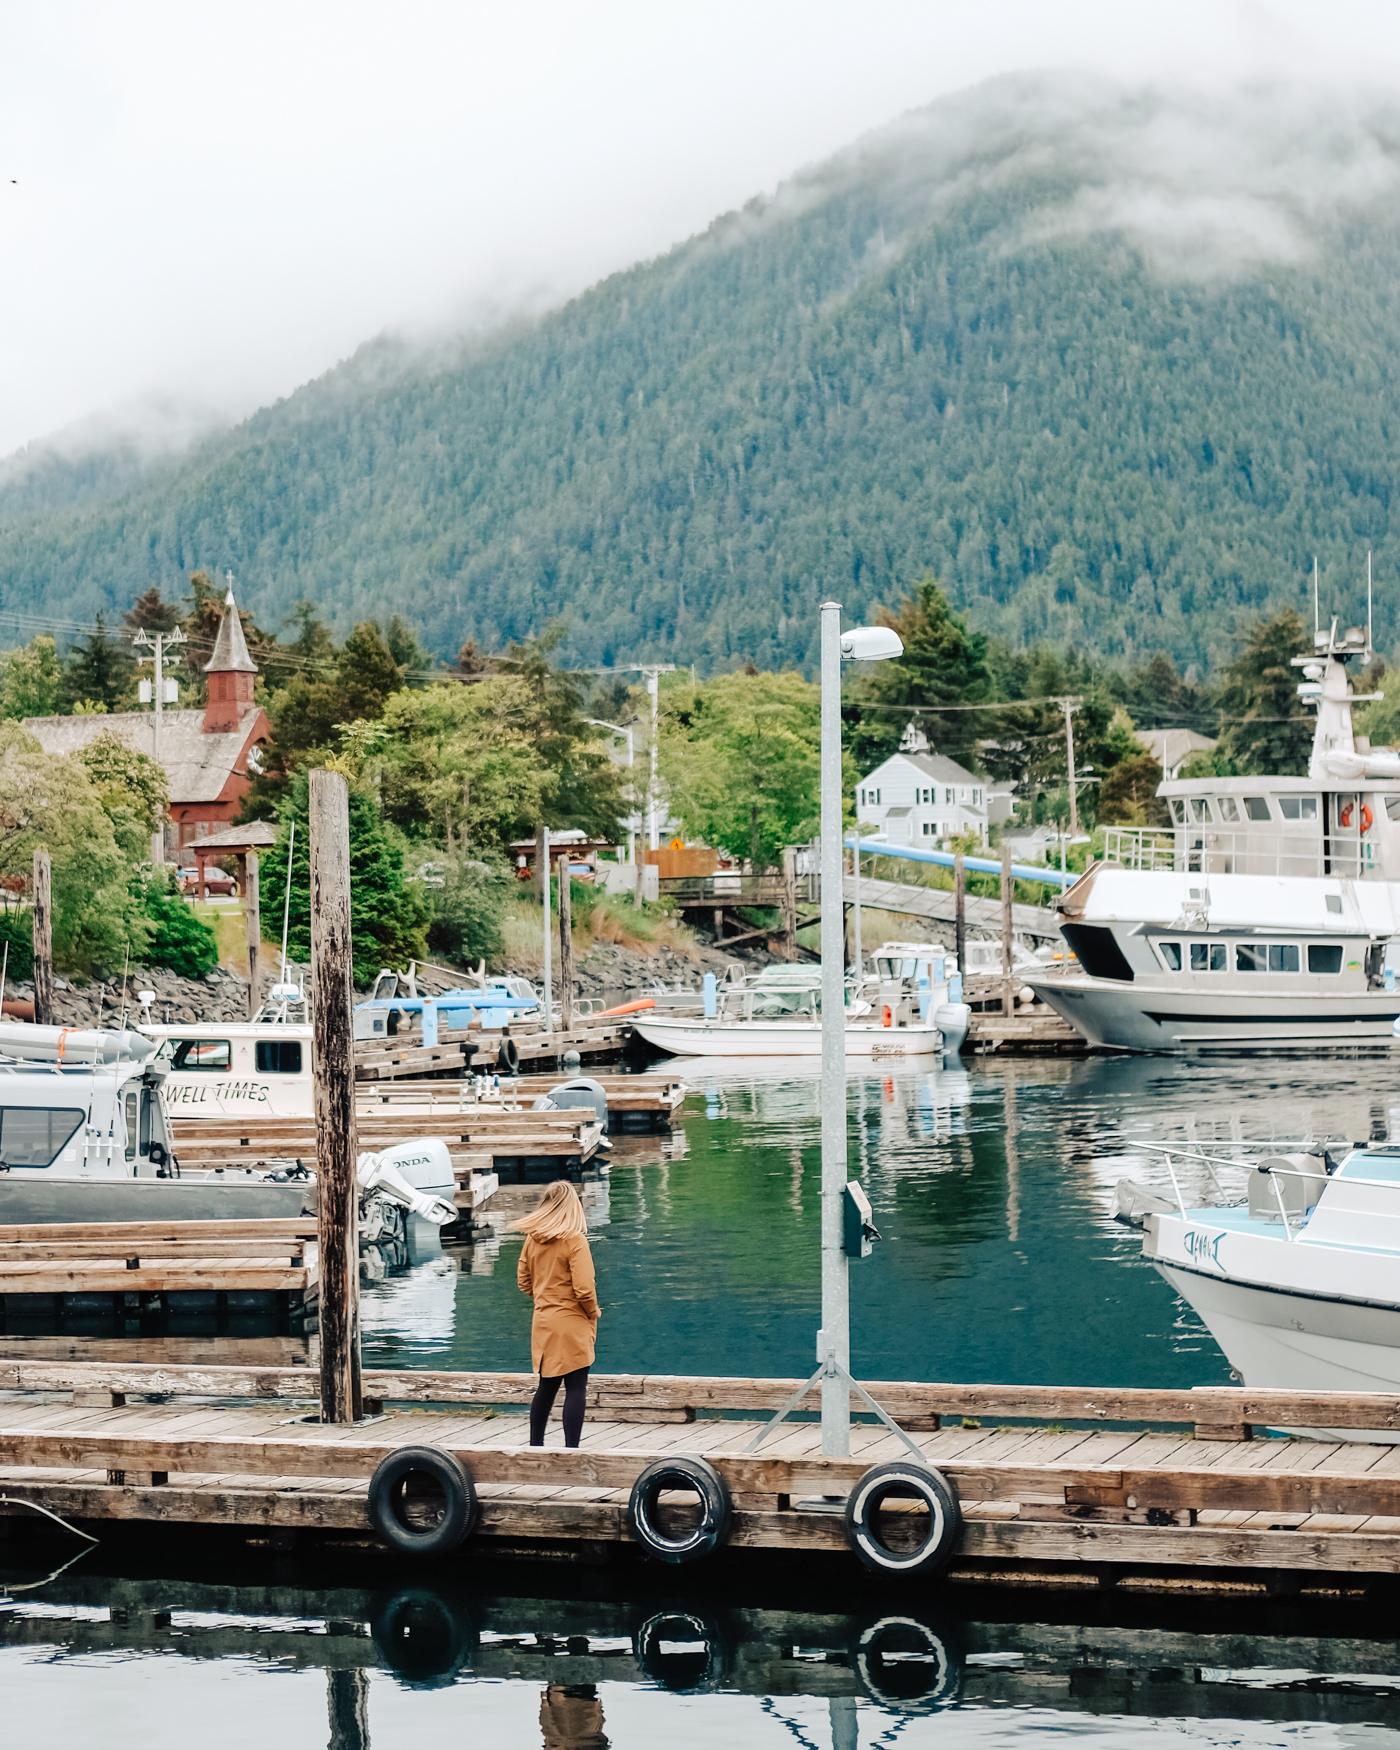 The harbor of Sitka, Alaska